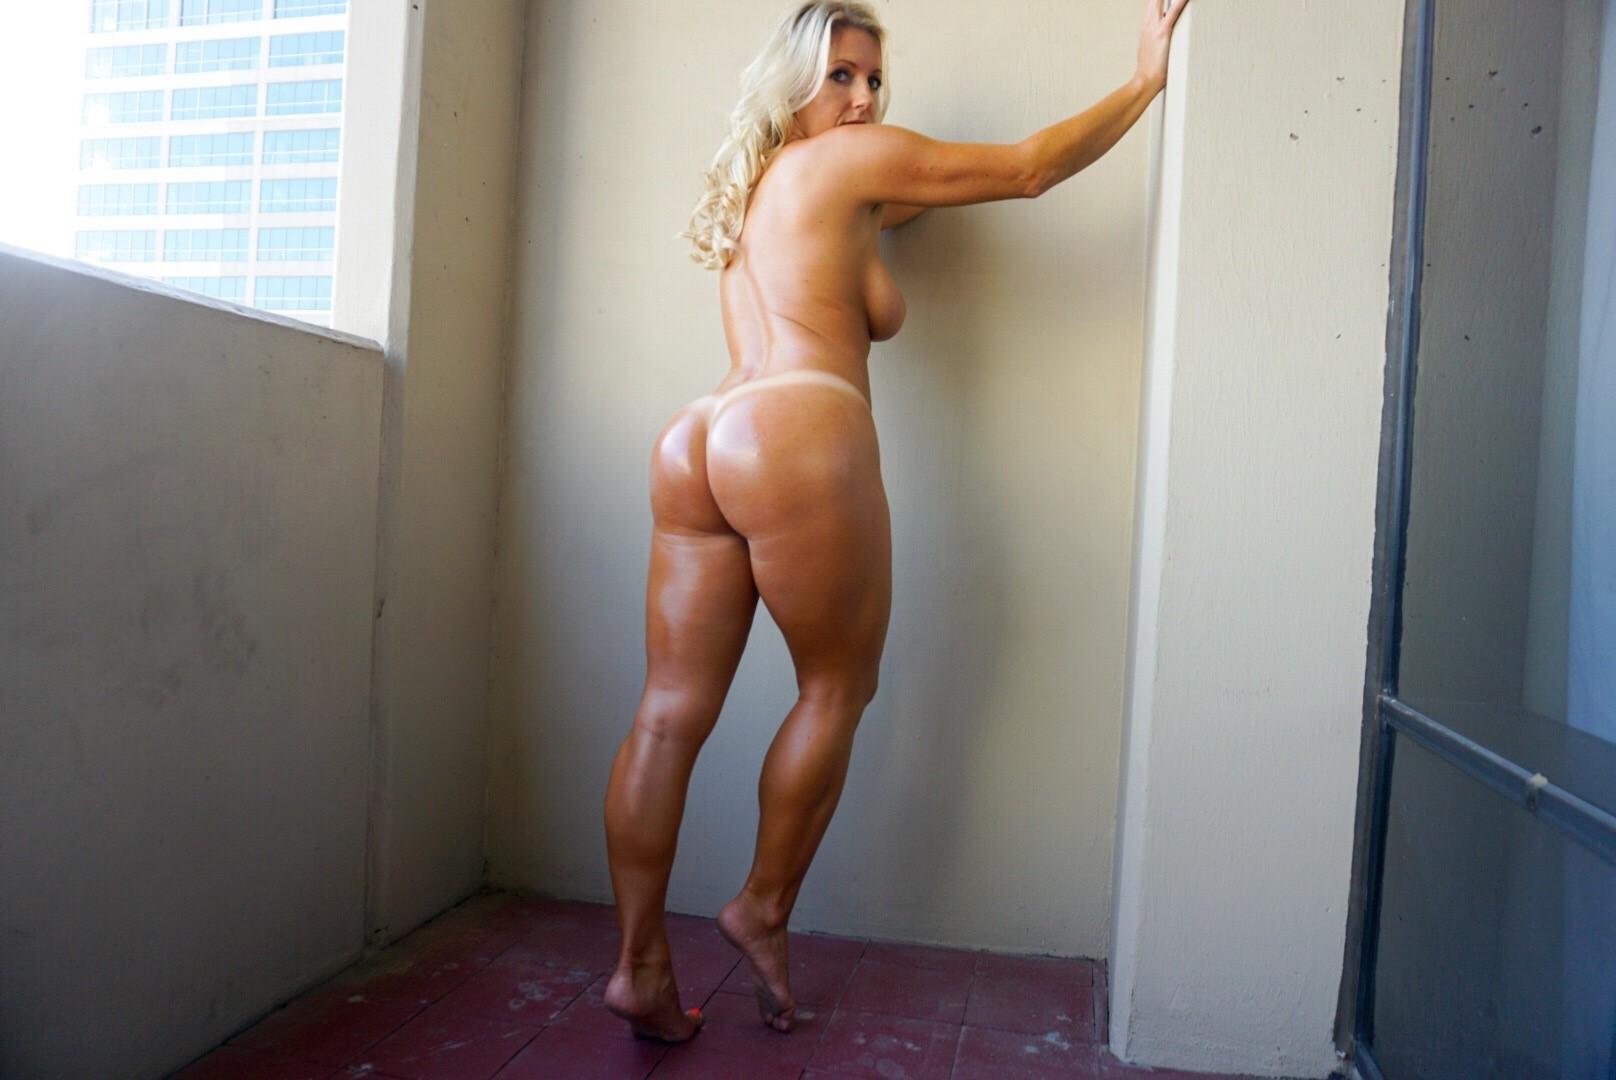 Texas thighs nude leaked milf courtney ann porn photo